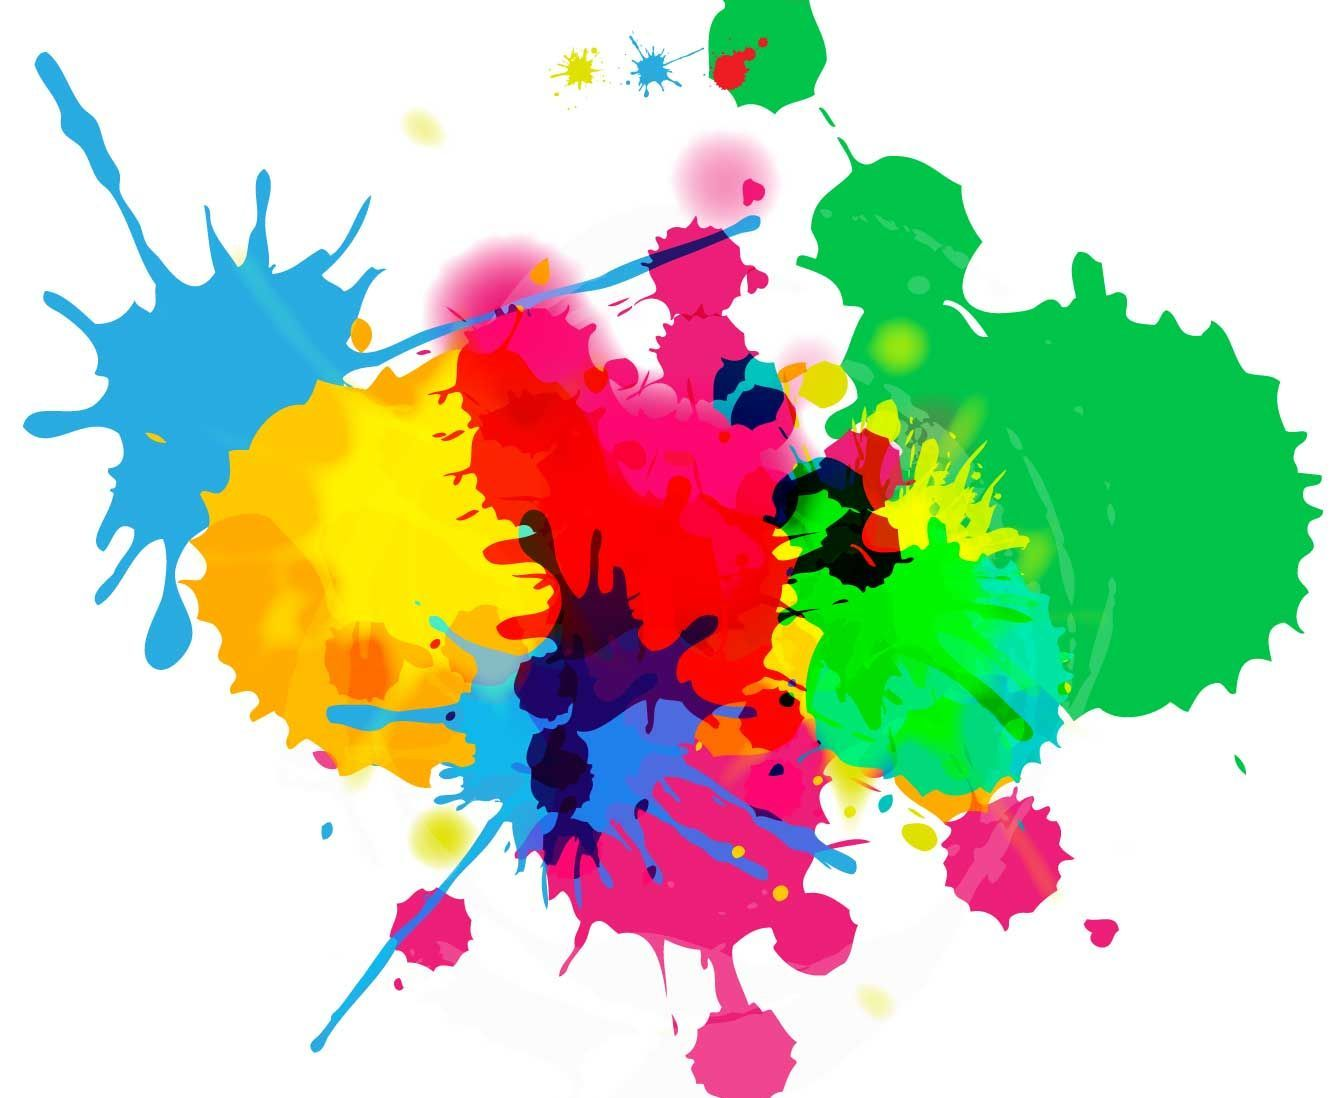 Web Design Colors Usage For Successful Websites